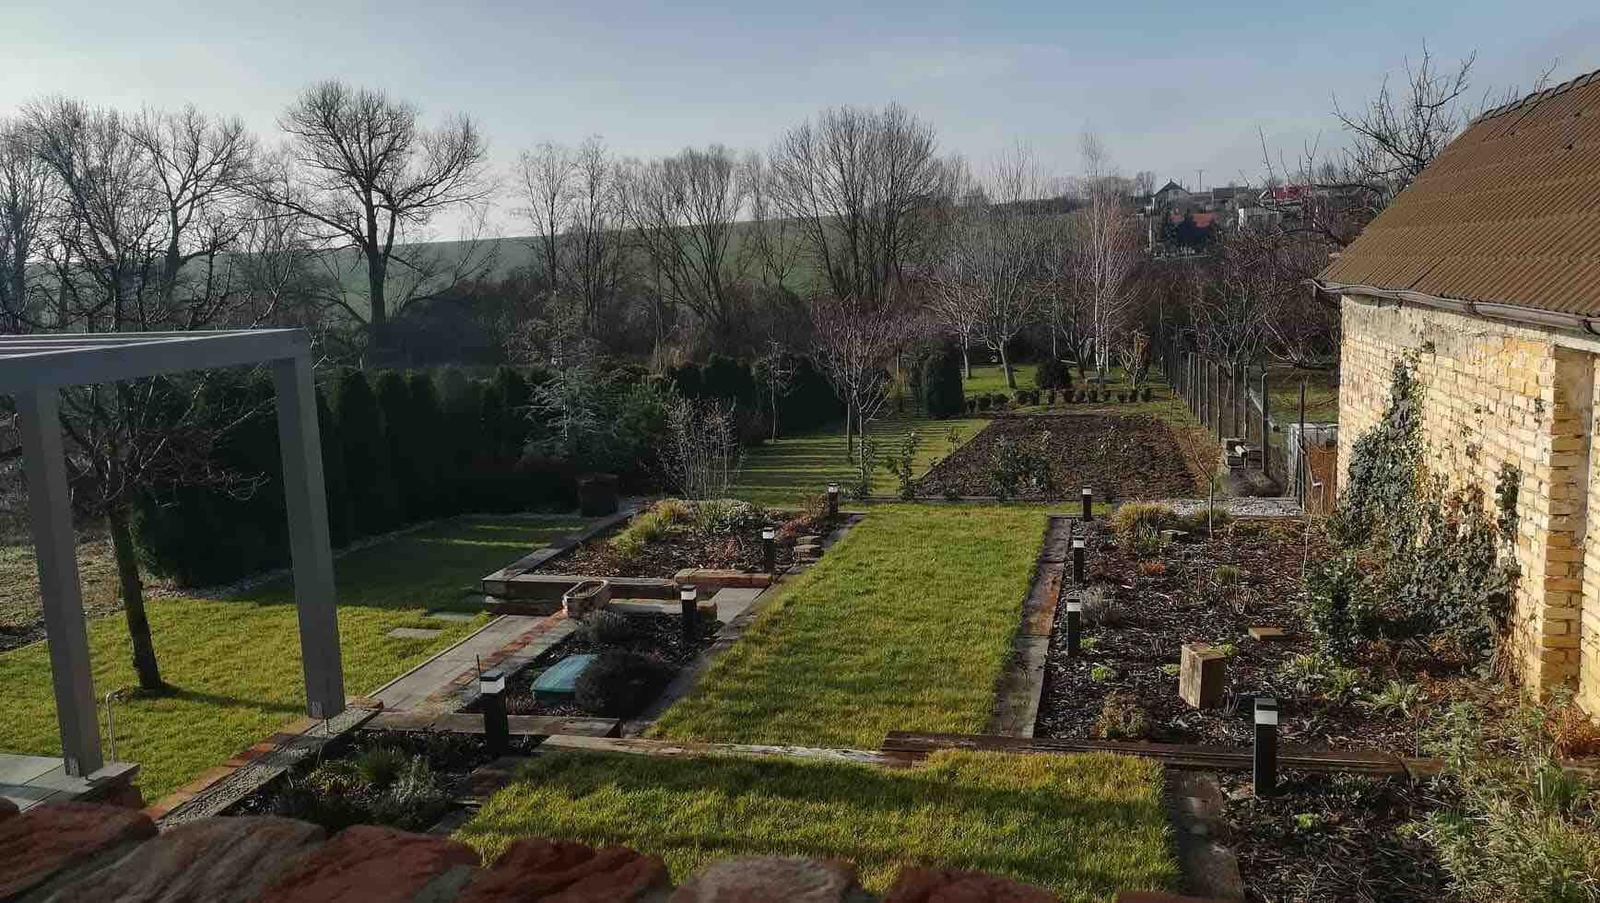 Názov stavby 3 - in da garden - marec 2019